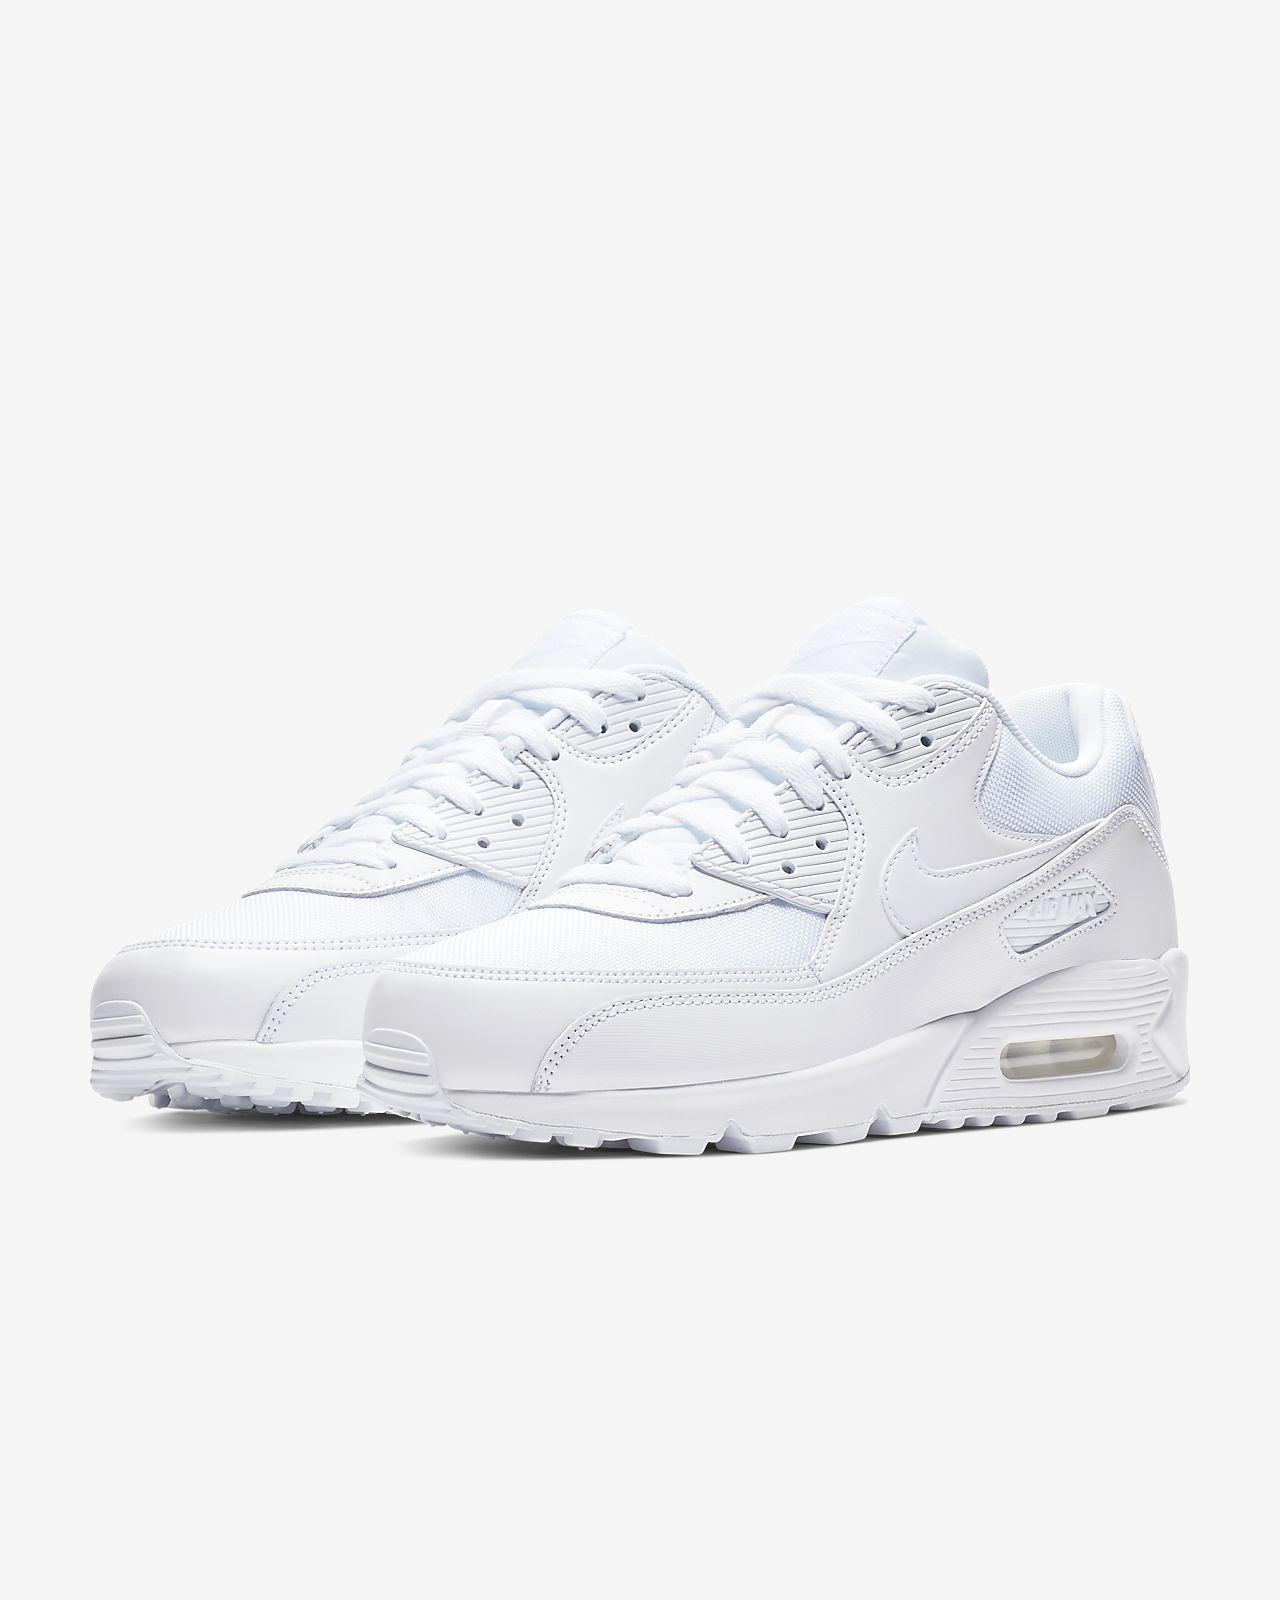 4d1af18d801 Low Resolution Nike Air Max 90 Essential Men s Shoe Nike Air Max 90  Essential Men s Shoe